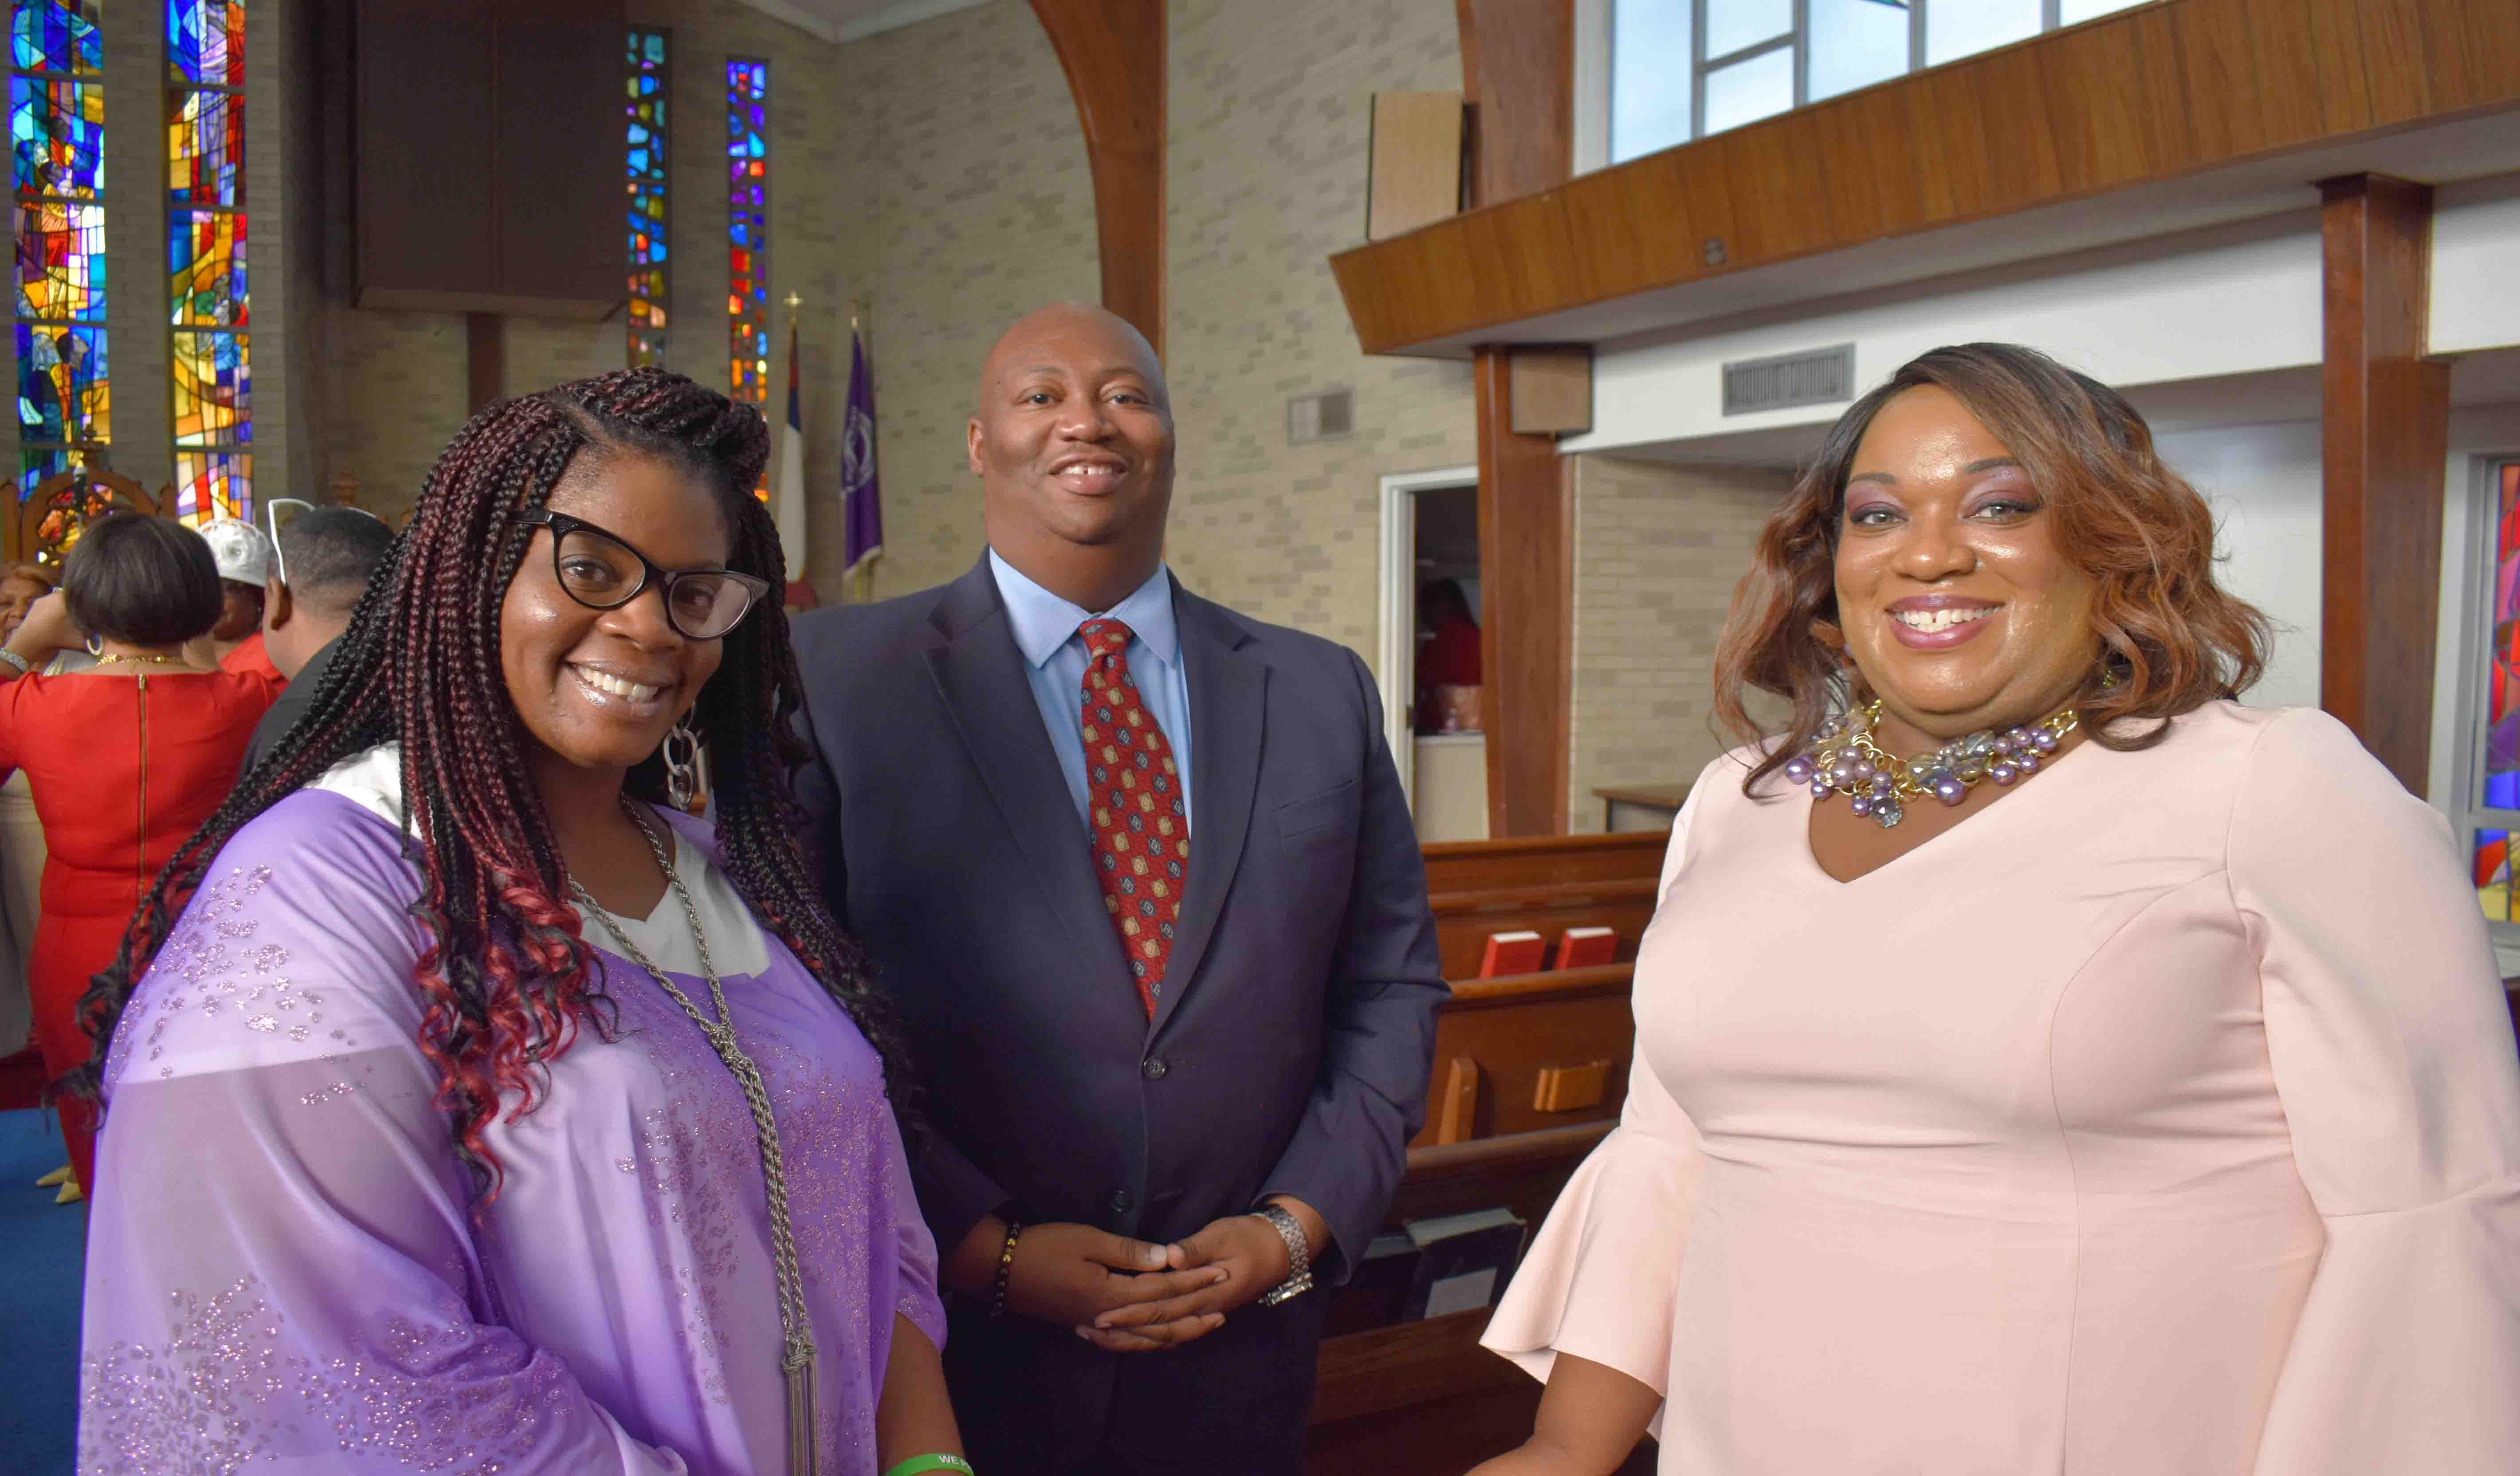 LaFrancis Pfifer, Lee Honorable, Shayla Alexander